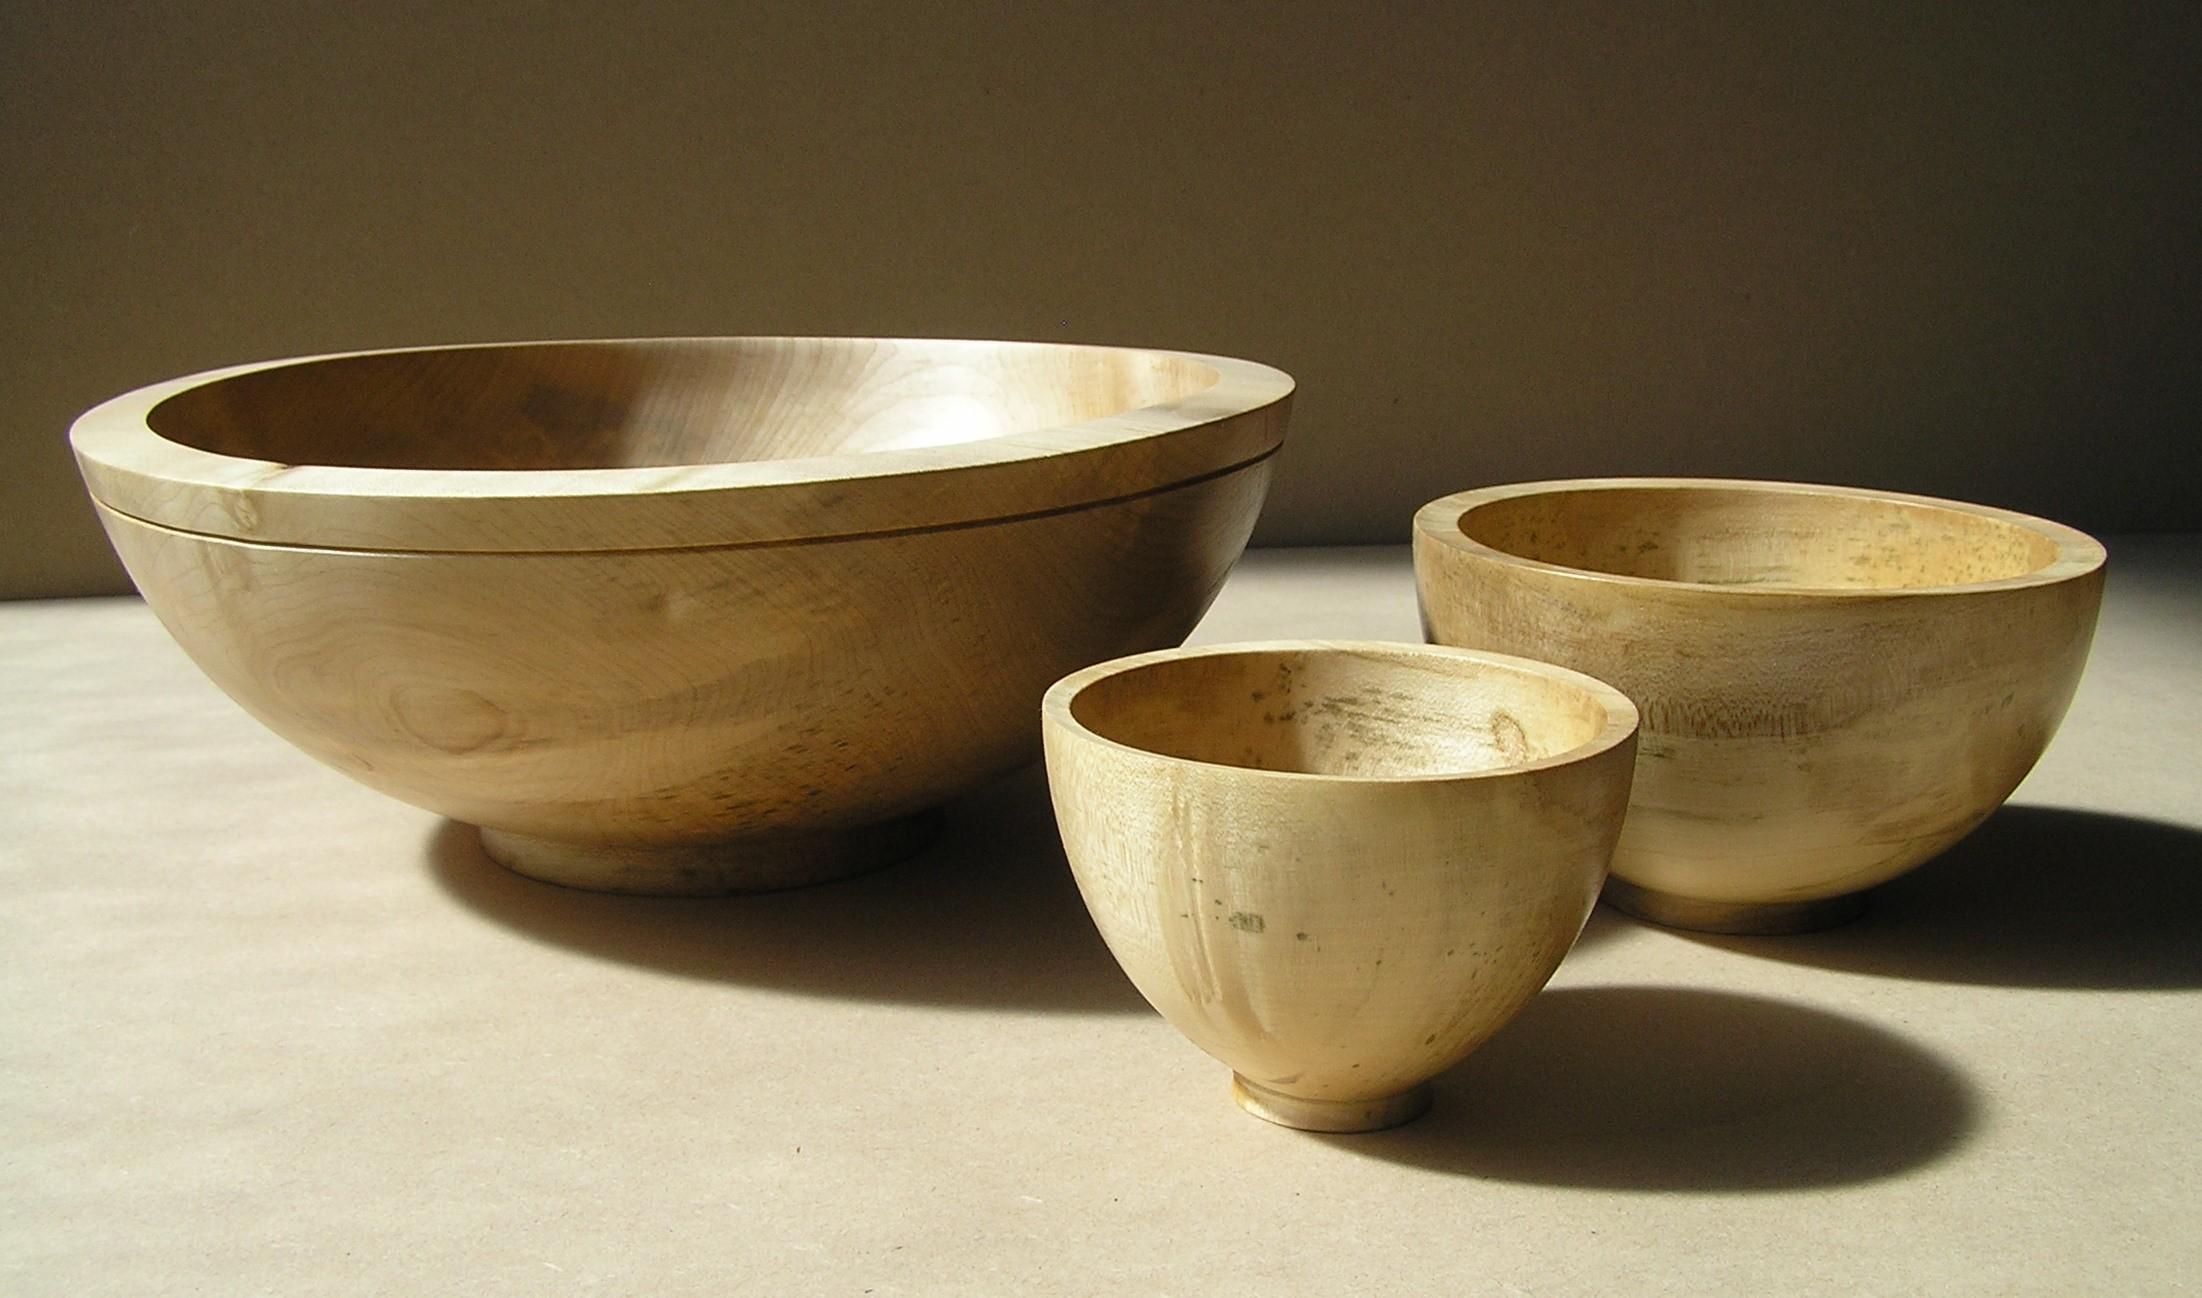 sycamore bowls , sycamore , bowls, woodturning, green wood, Scottish, Scotland, woodturner, wooden bowl, custom made, bespoke, wedding gift,